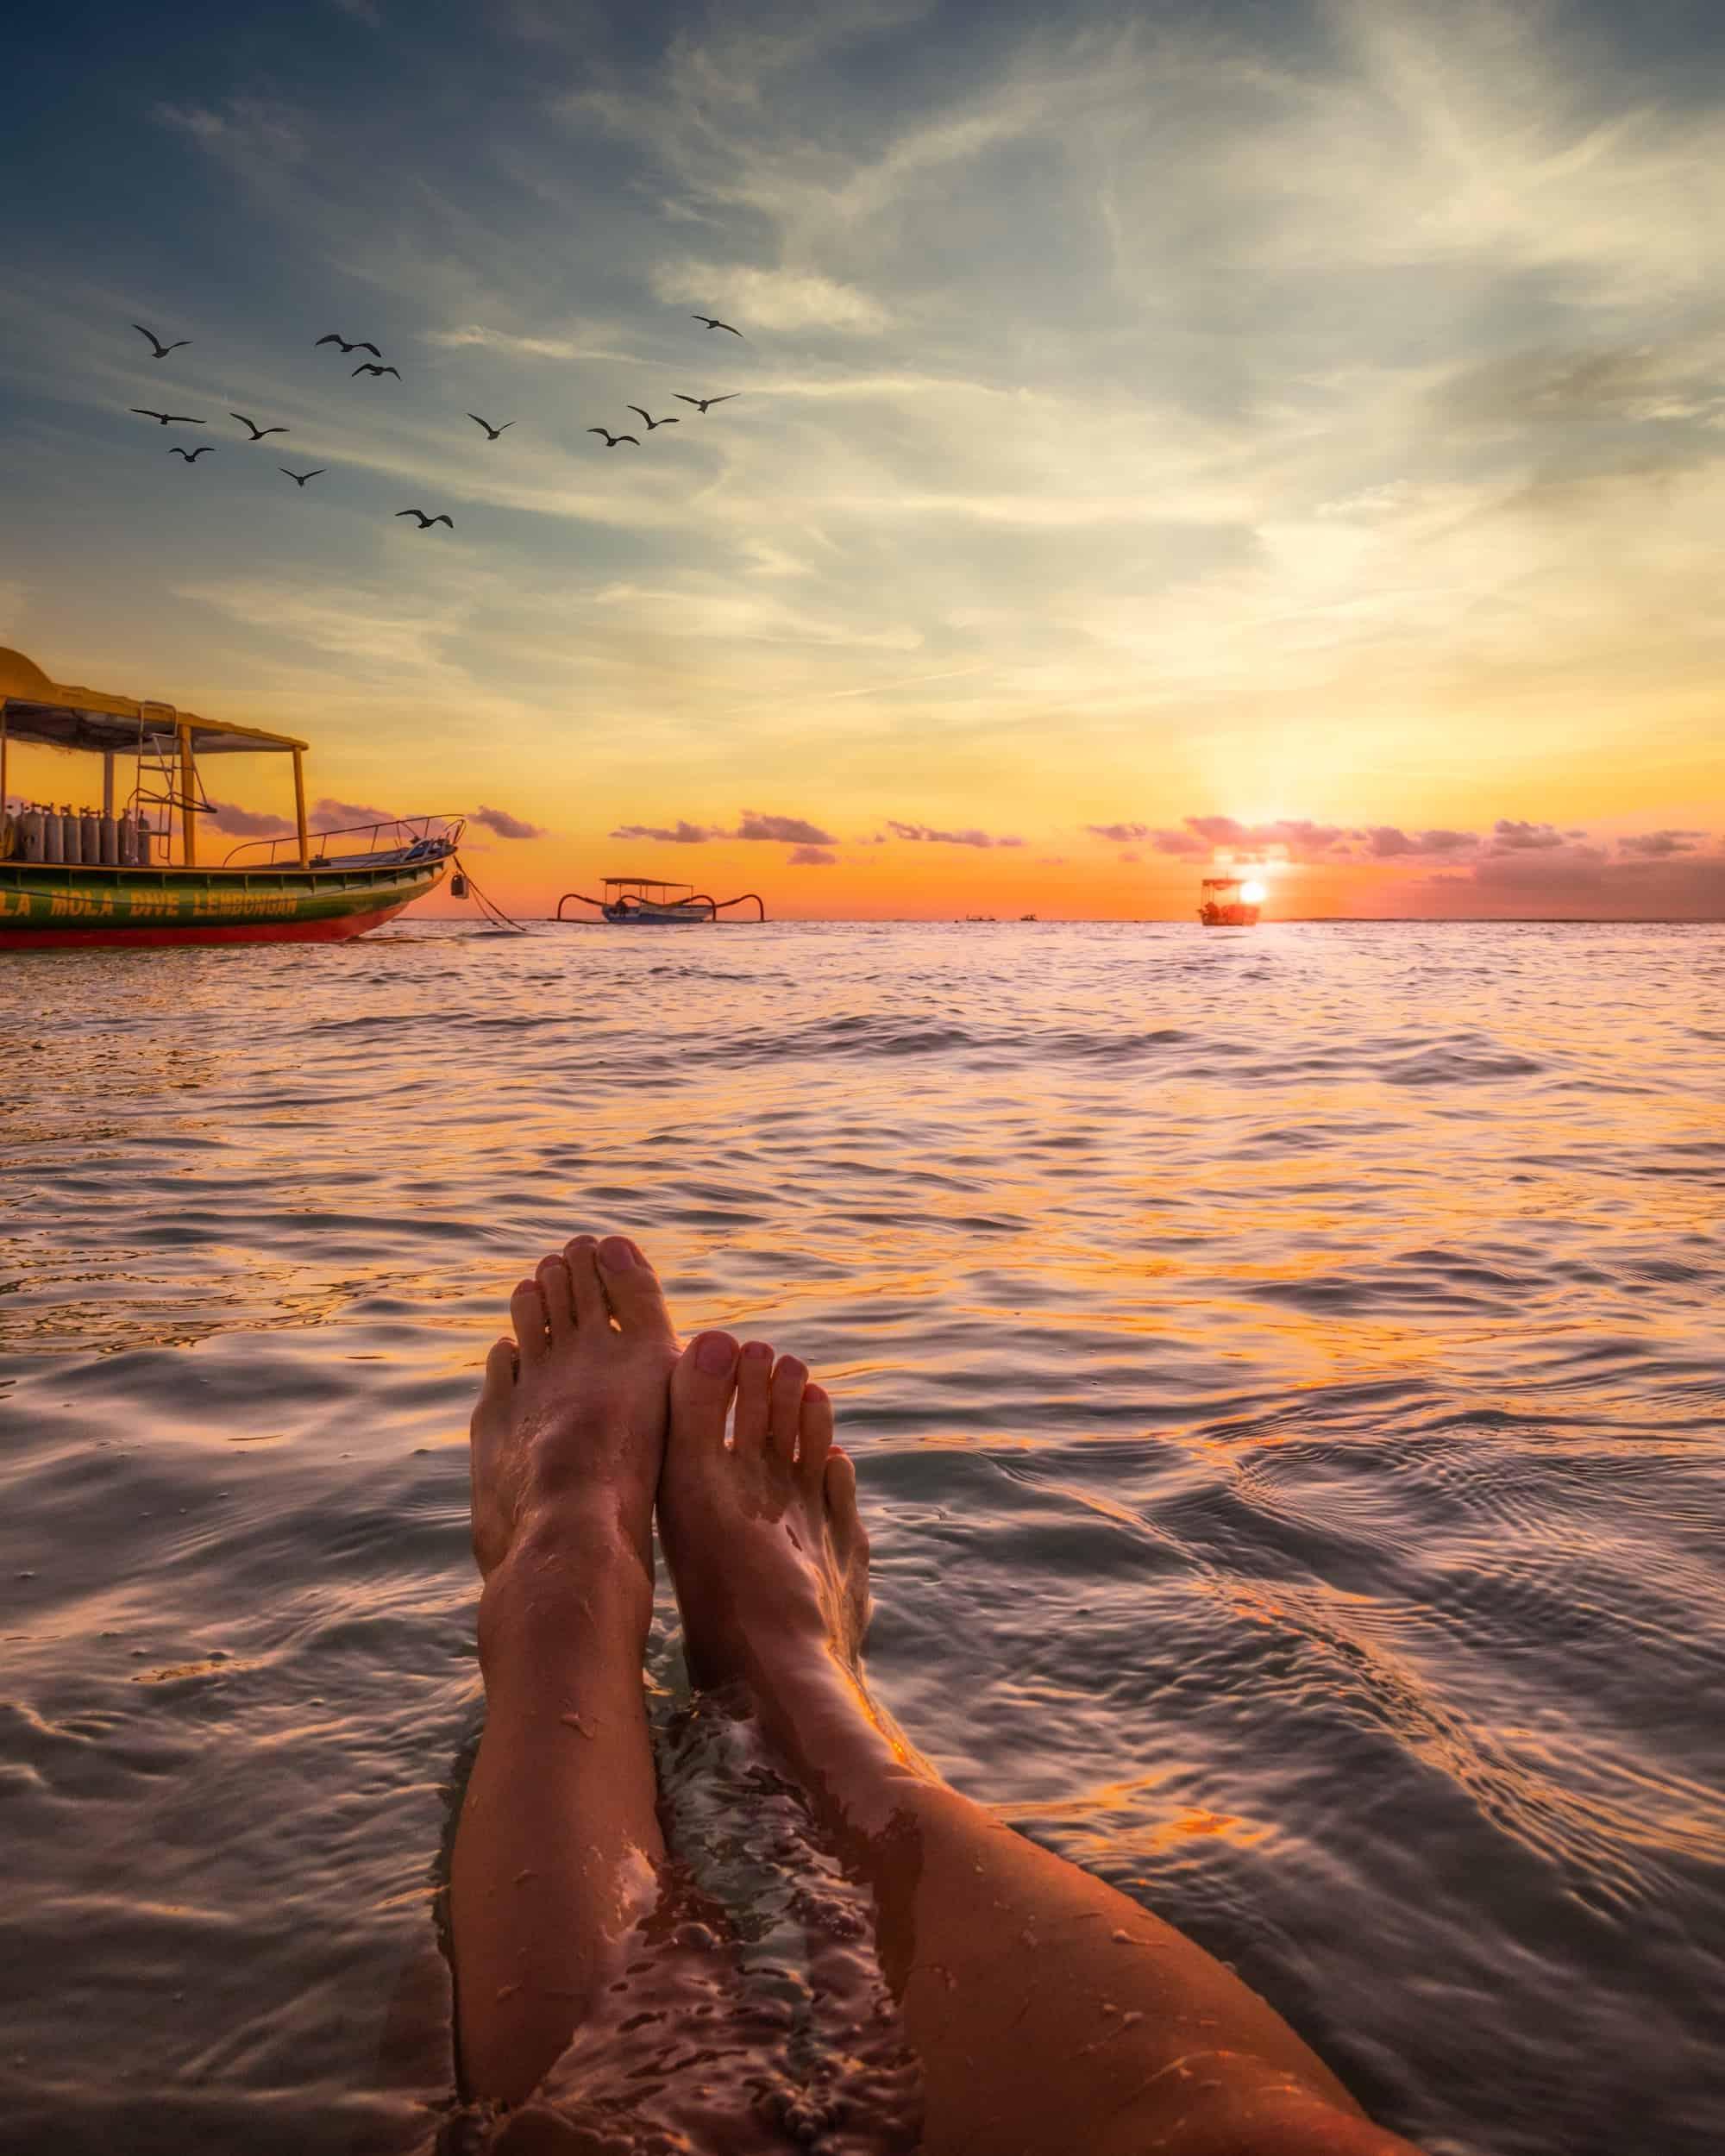 Bali sunset captions